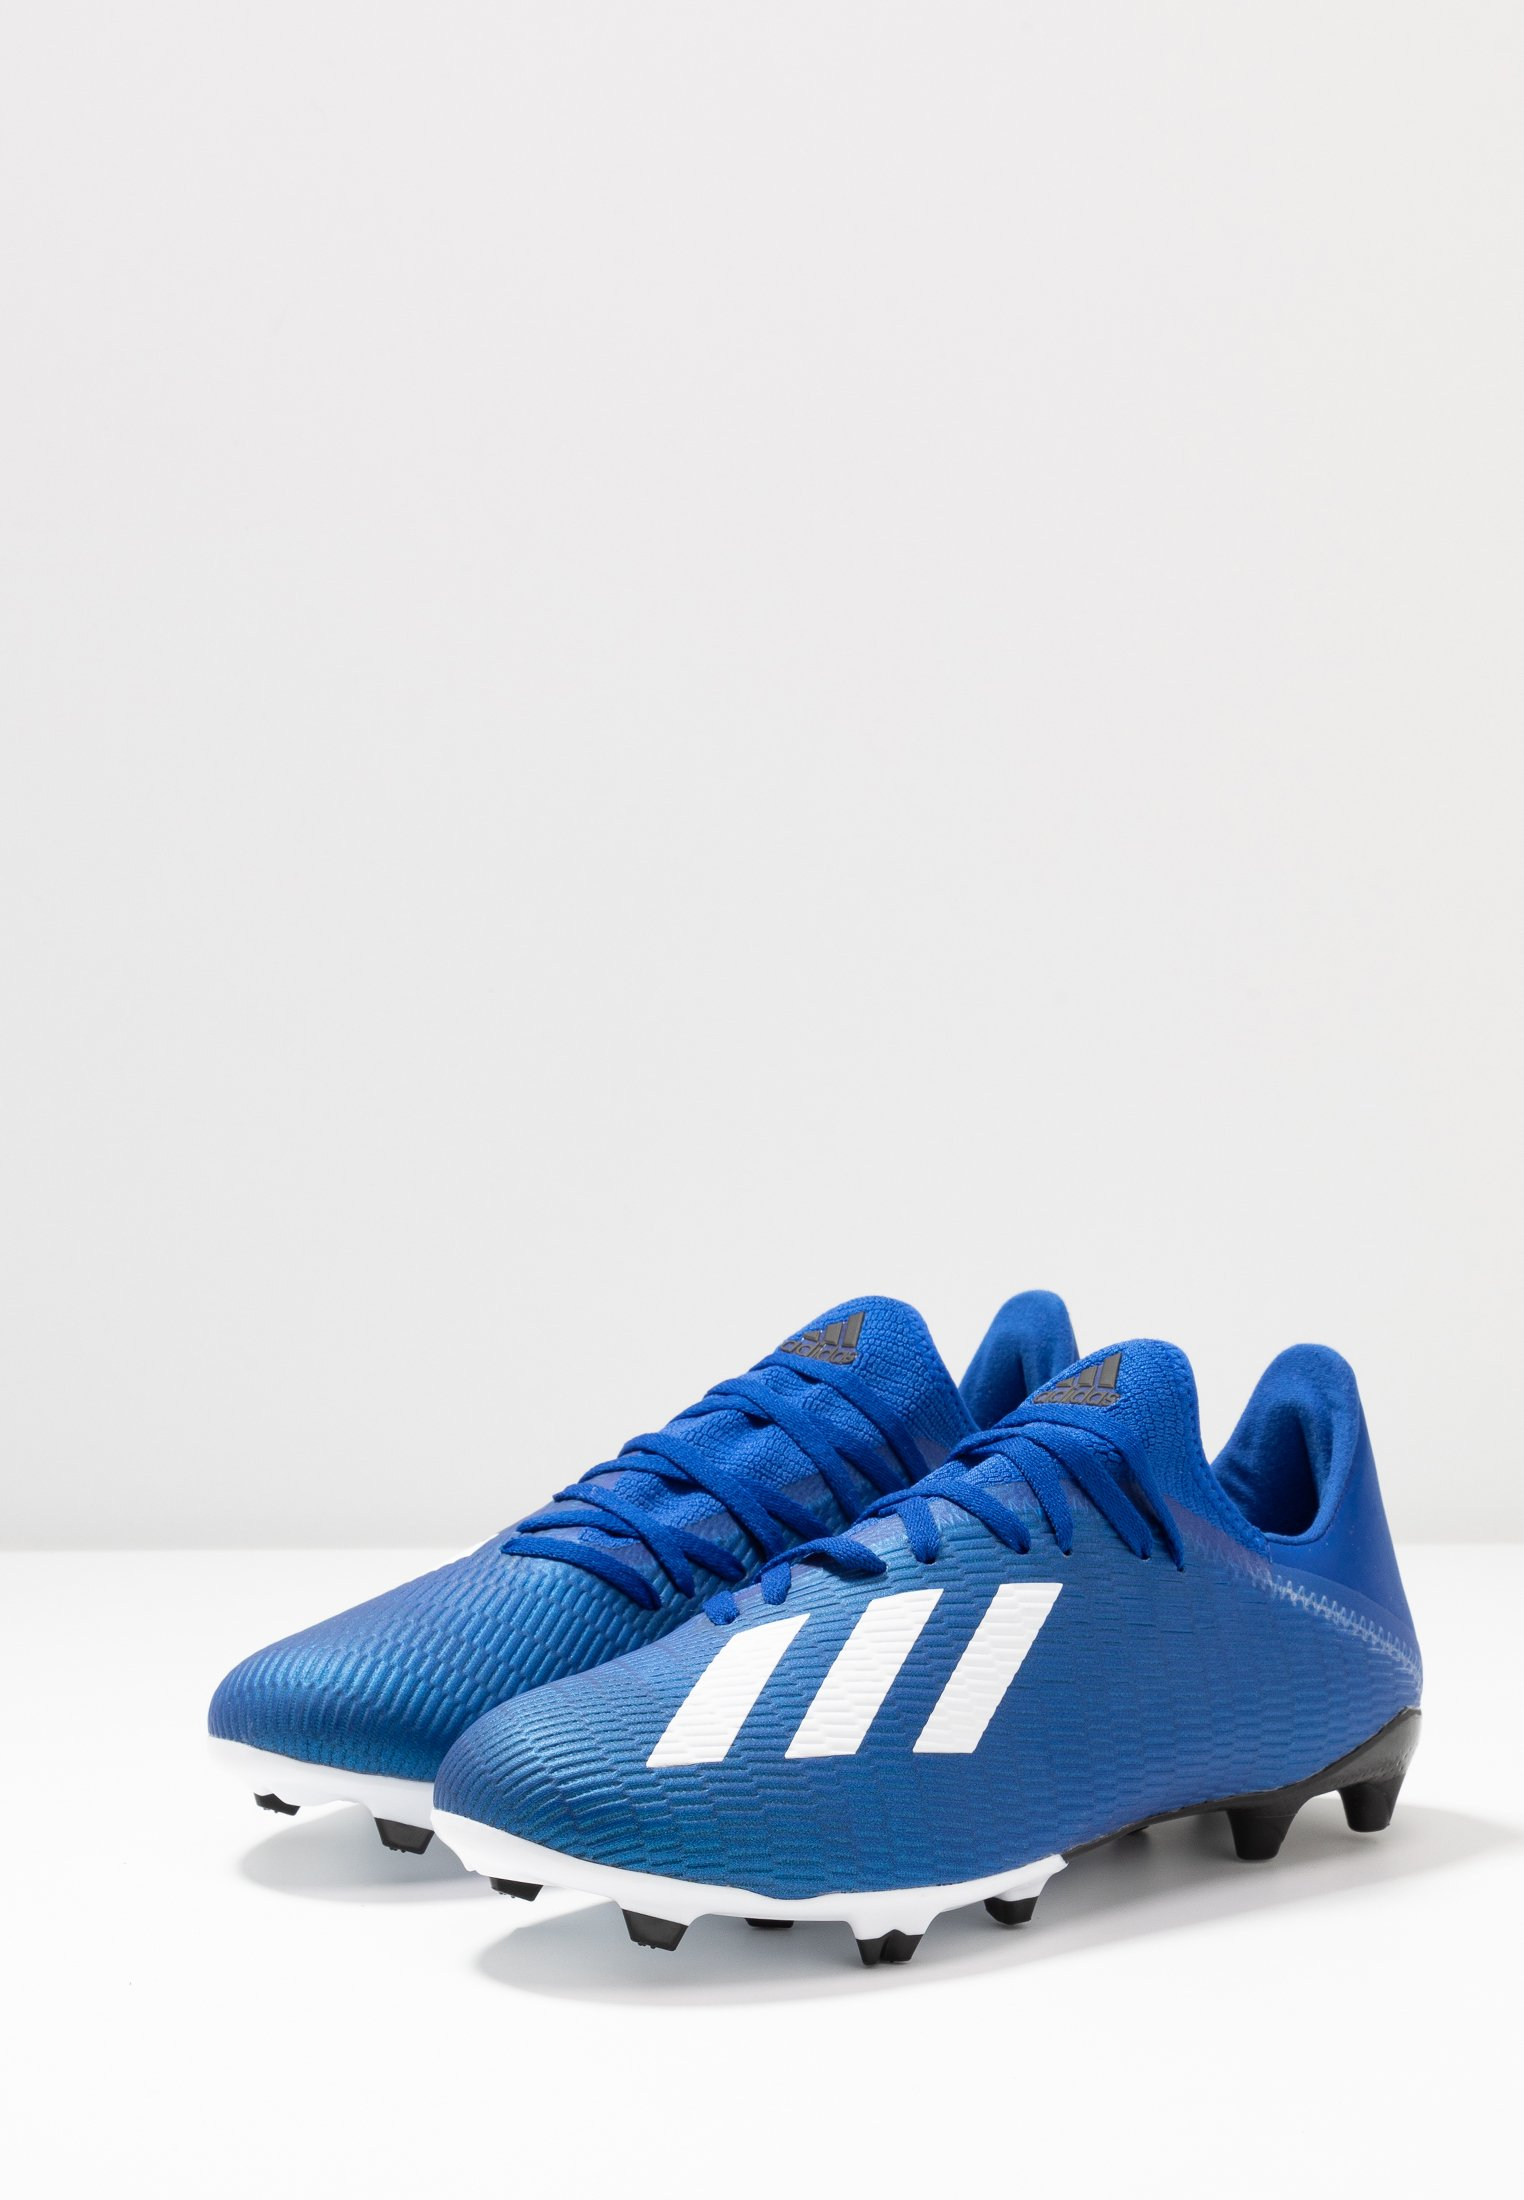 adidas Performance X 19.3 FG - Fotballsko - royal blue/footwear white/core black